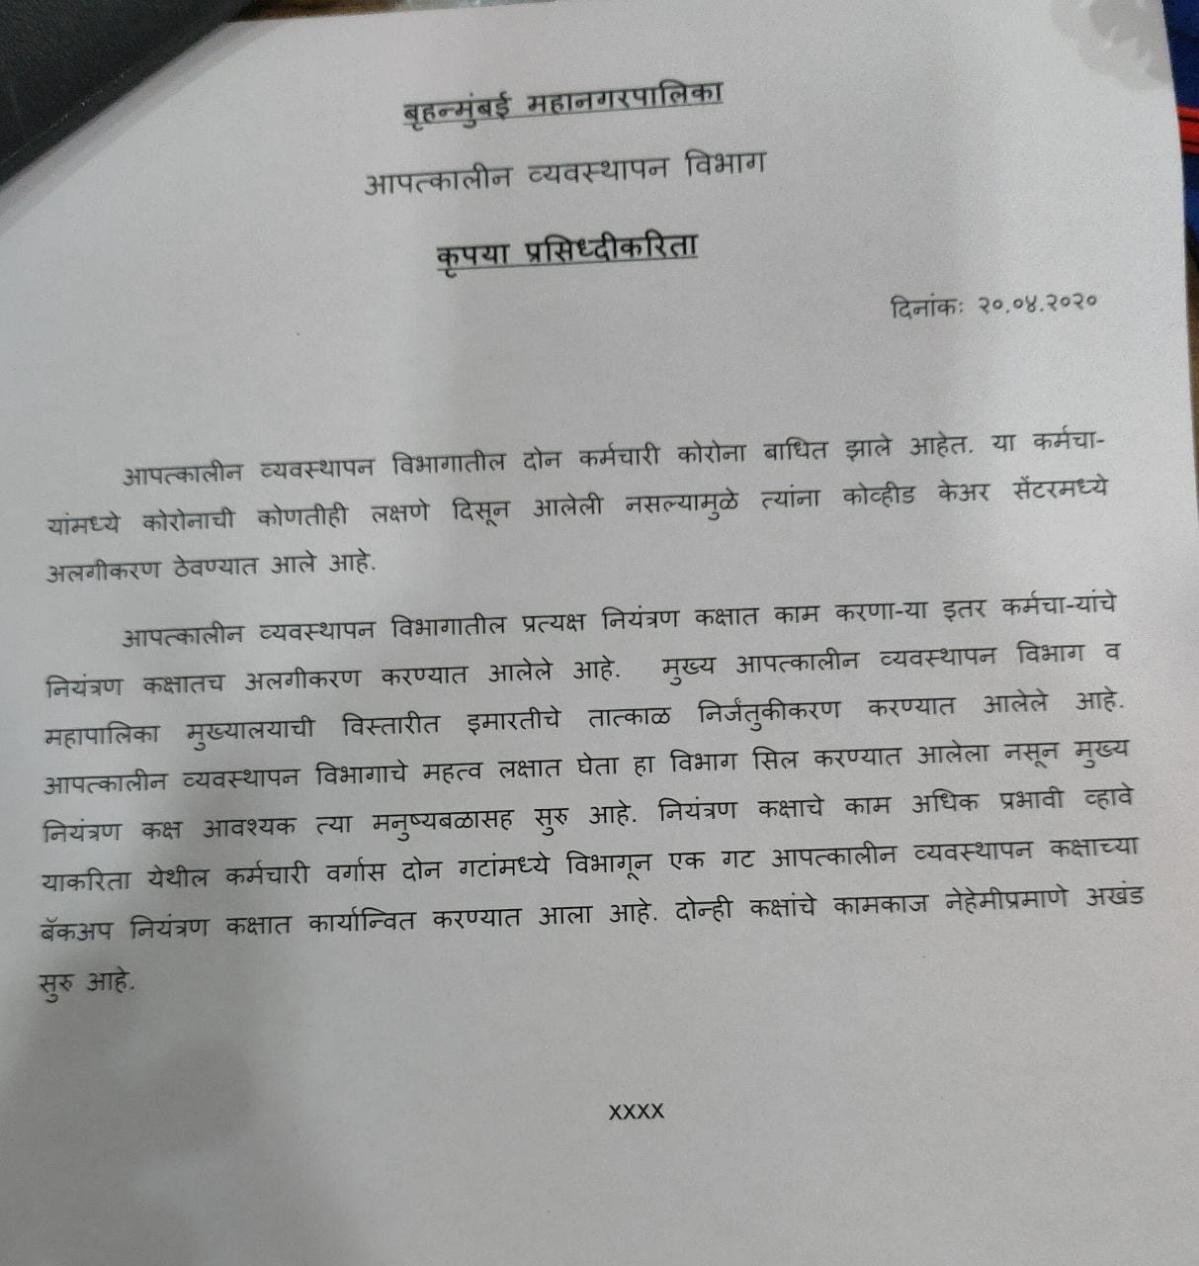 Coronavirus in Mumbai: 2 BMC disaster control room staff test positive for COVID-19